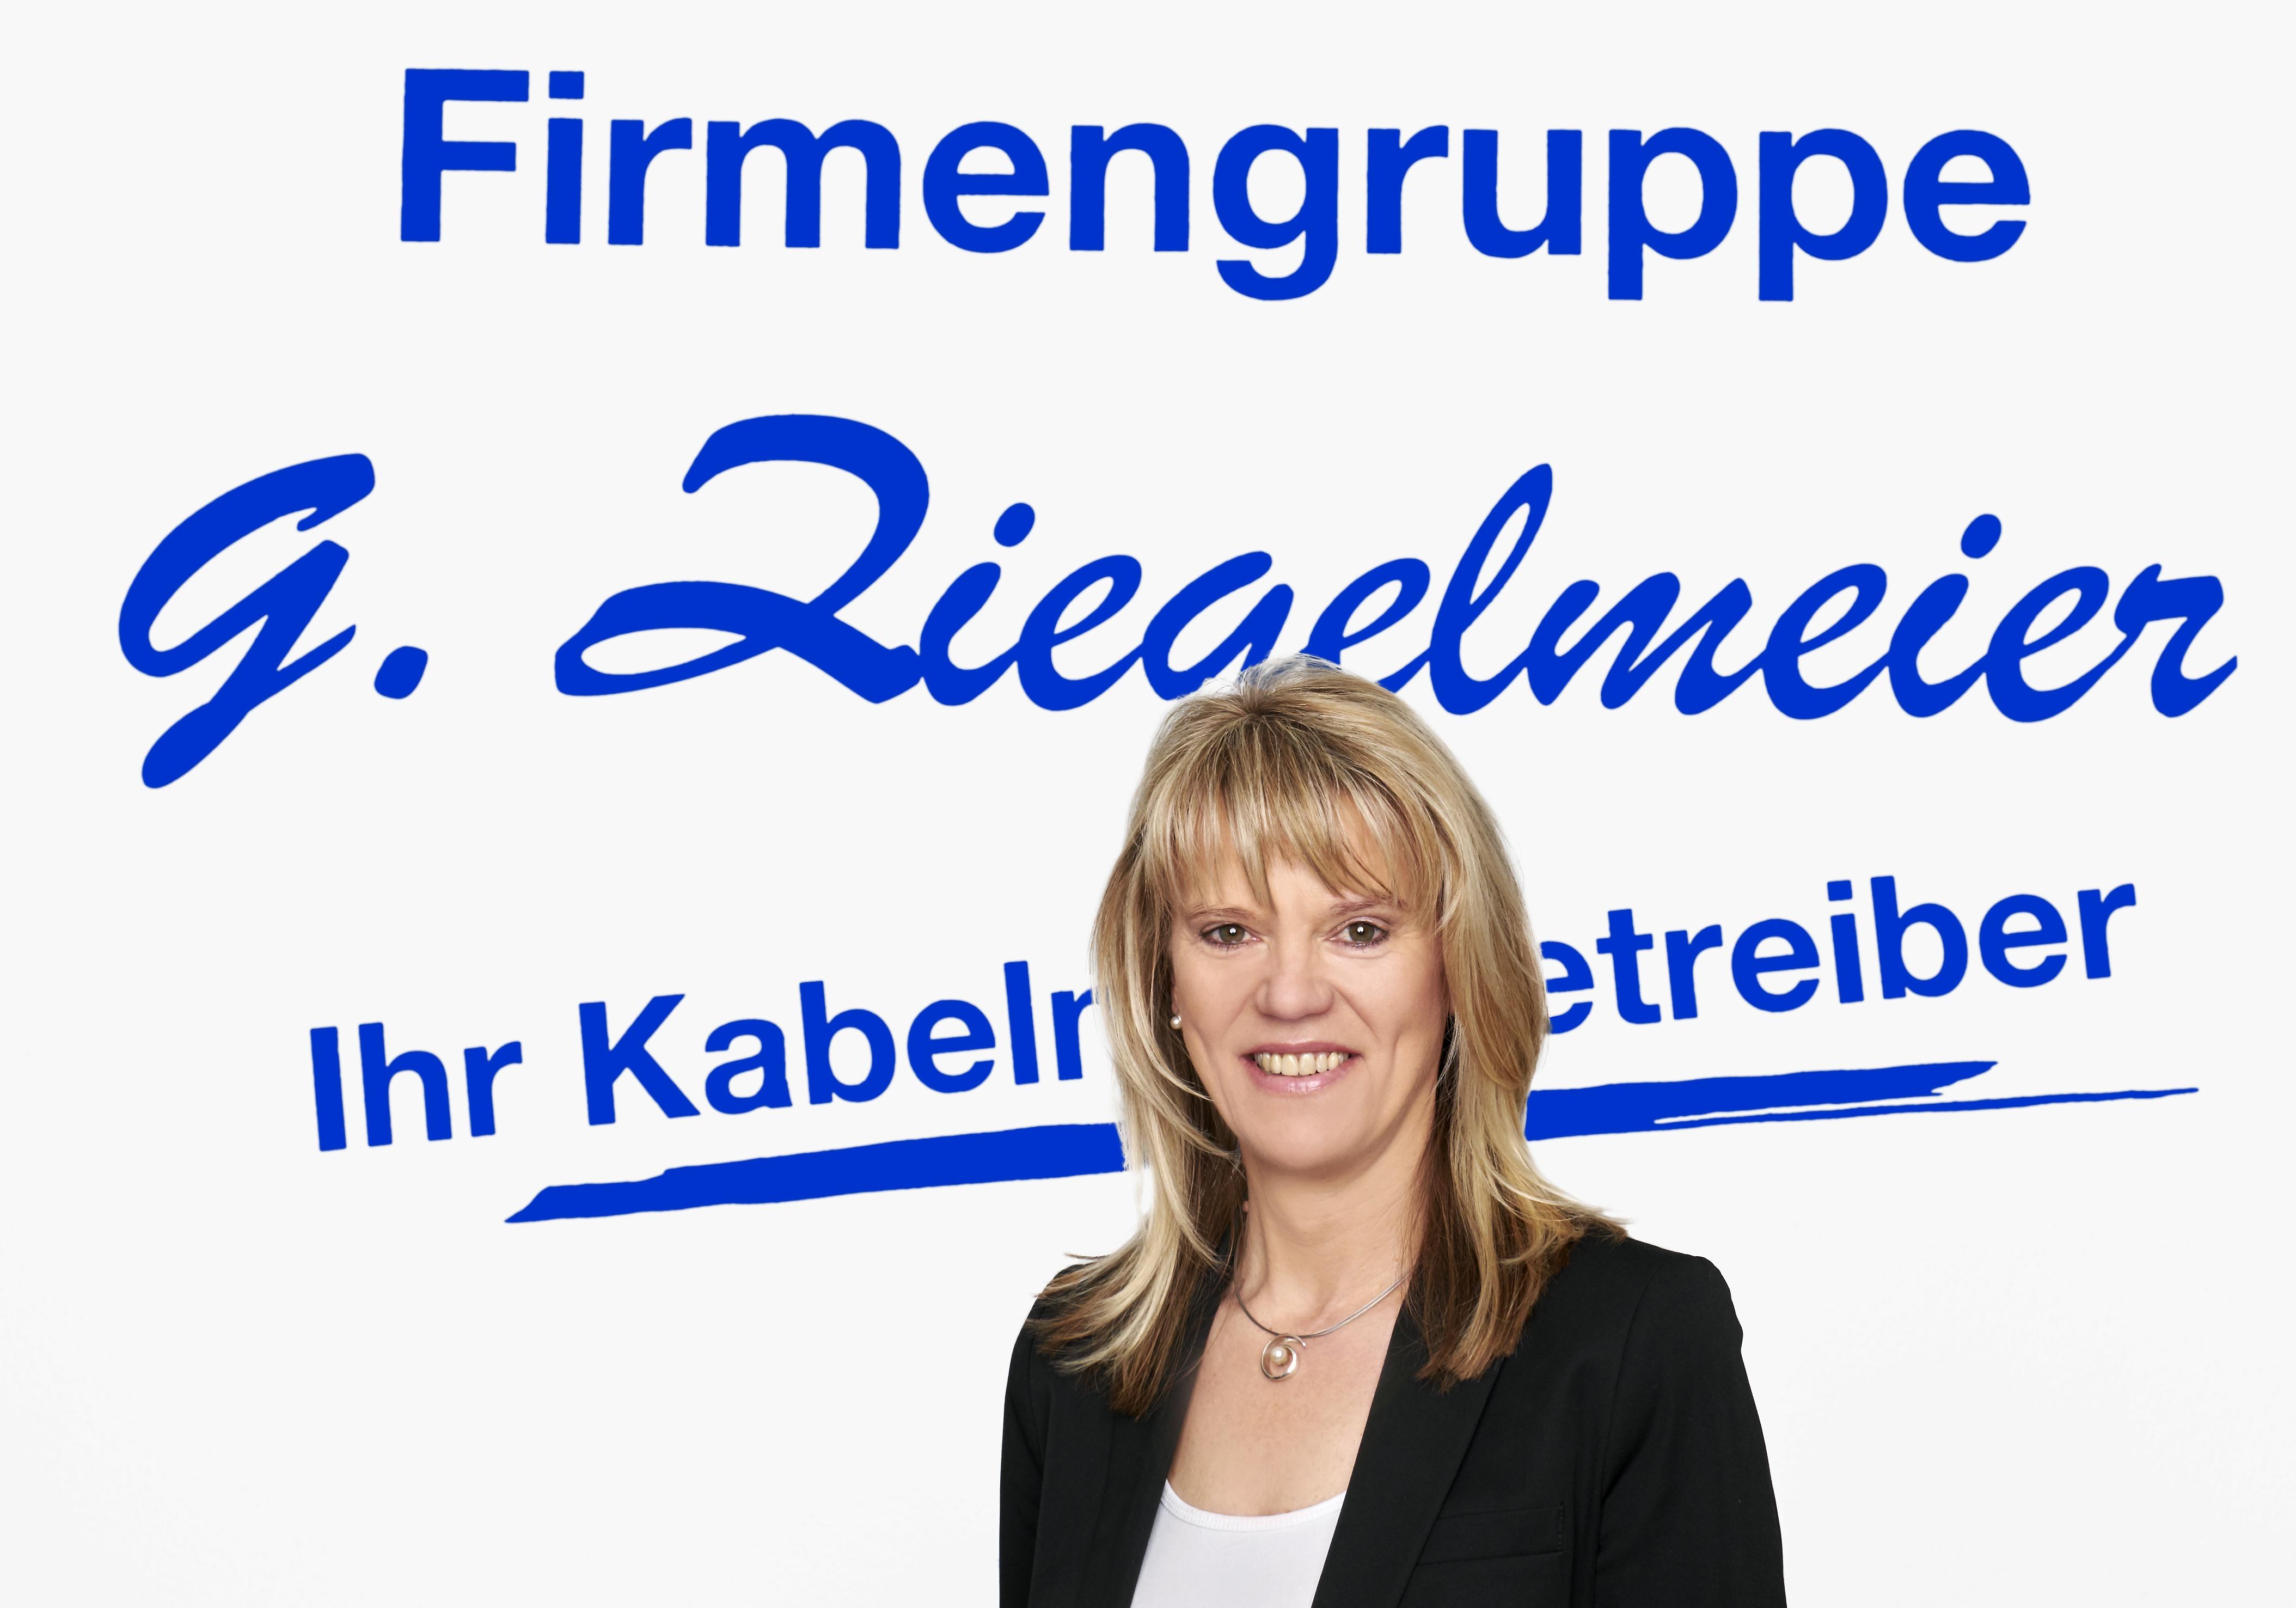 Cornelia Ziegelmeier